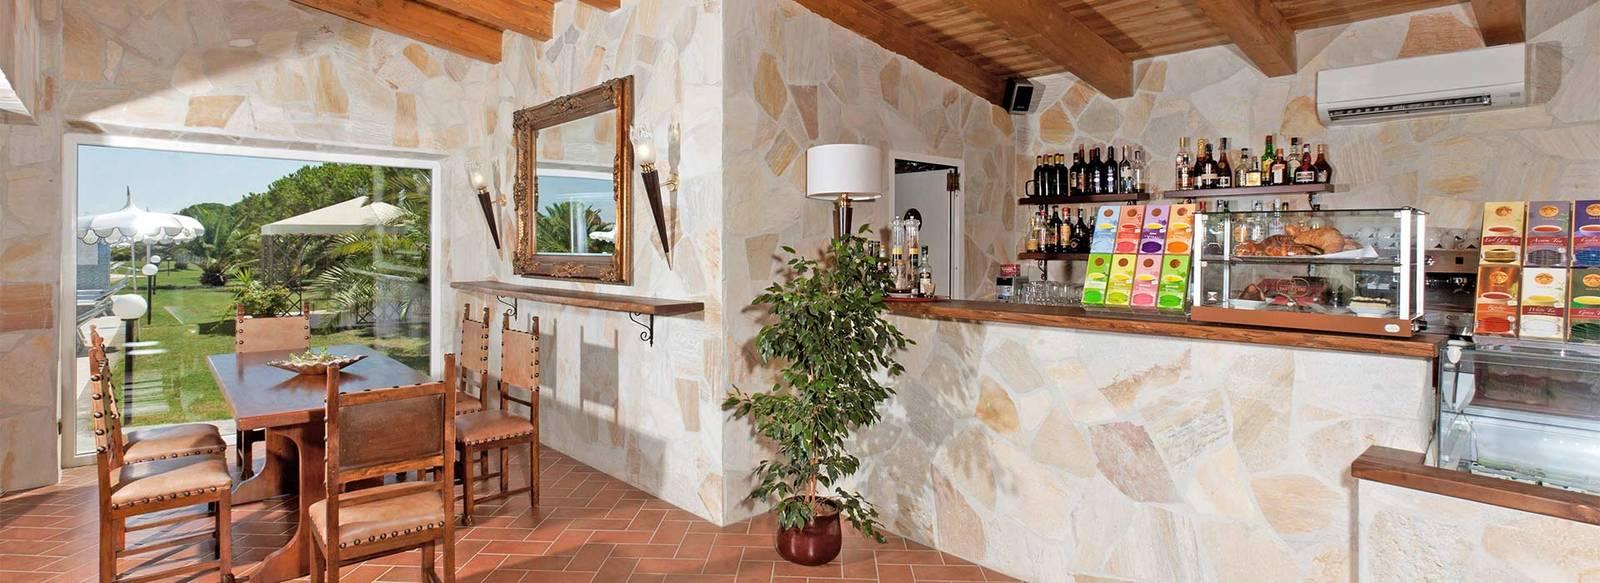 Resort-Fattoria nella Maremma Toscana